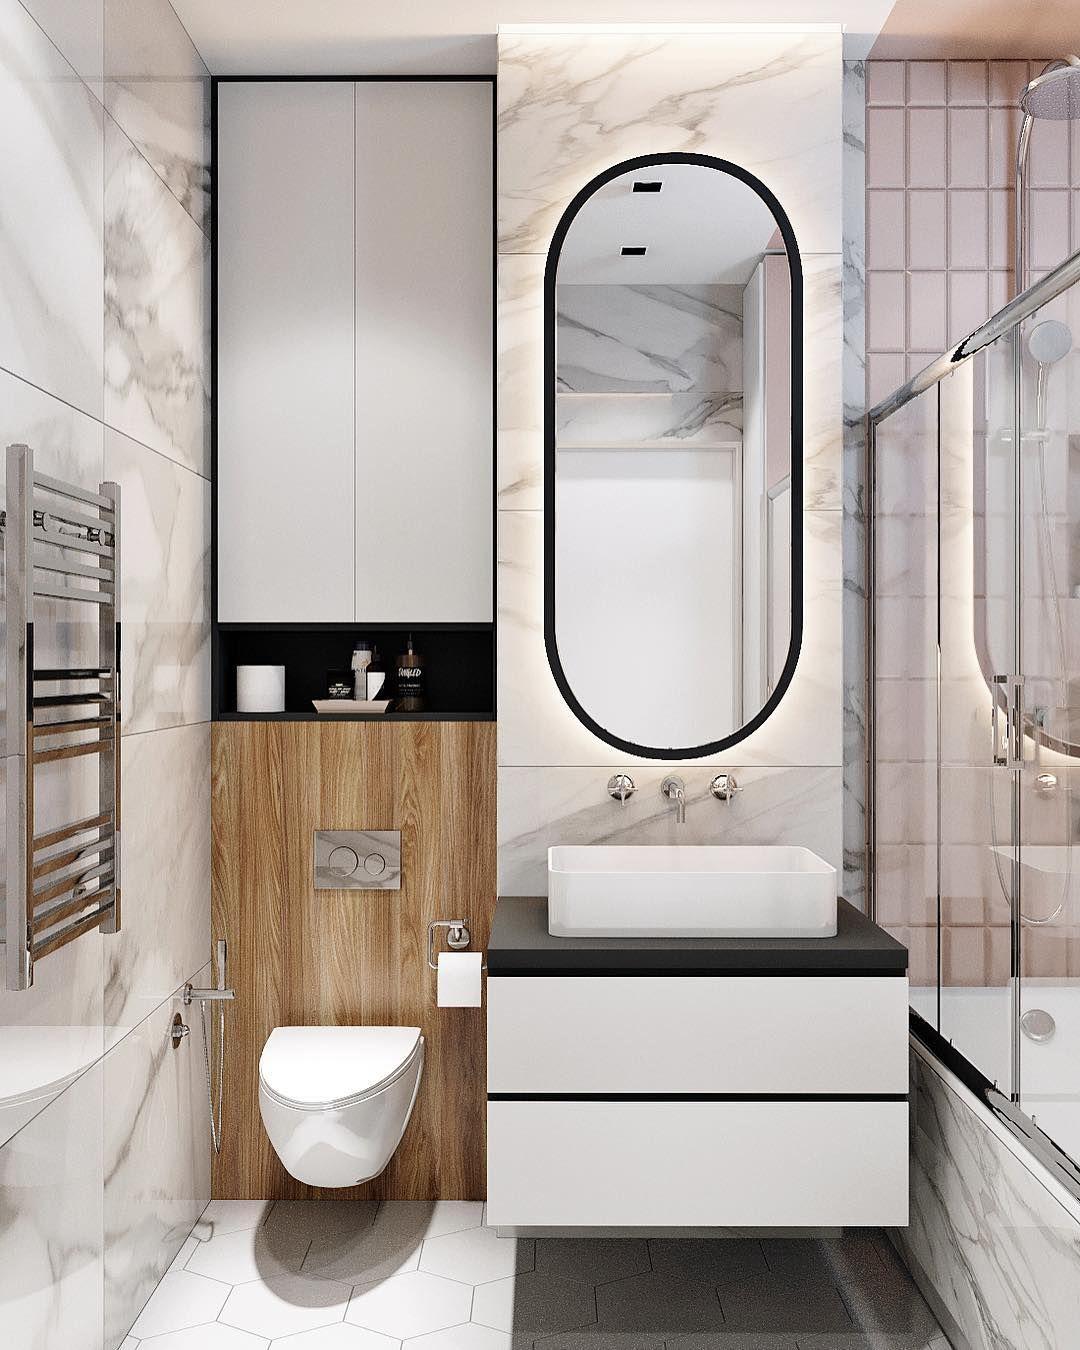 Russian Contemporary Apartment With Boca Do Lobo By Ekaterina Lashmano Contemporary Apartment Bronze Furniture Round Mirror Bathroom